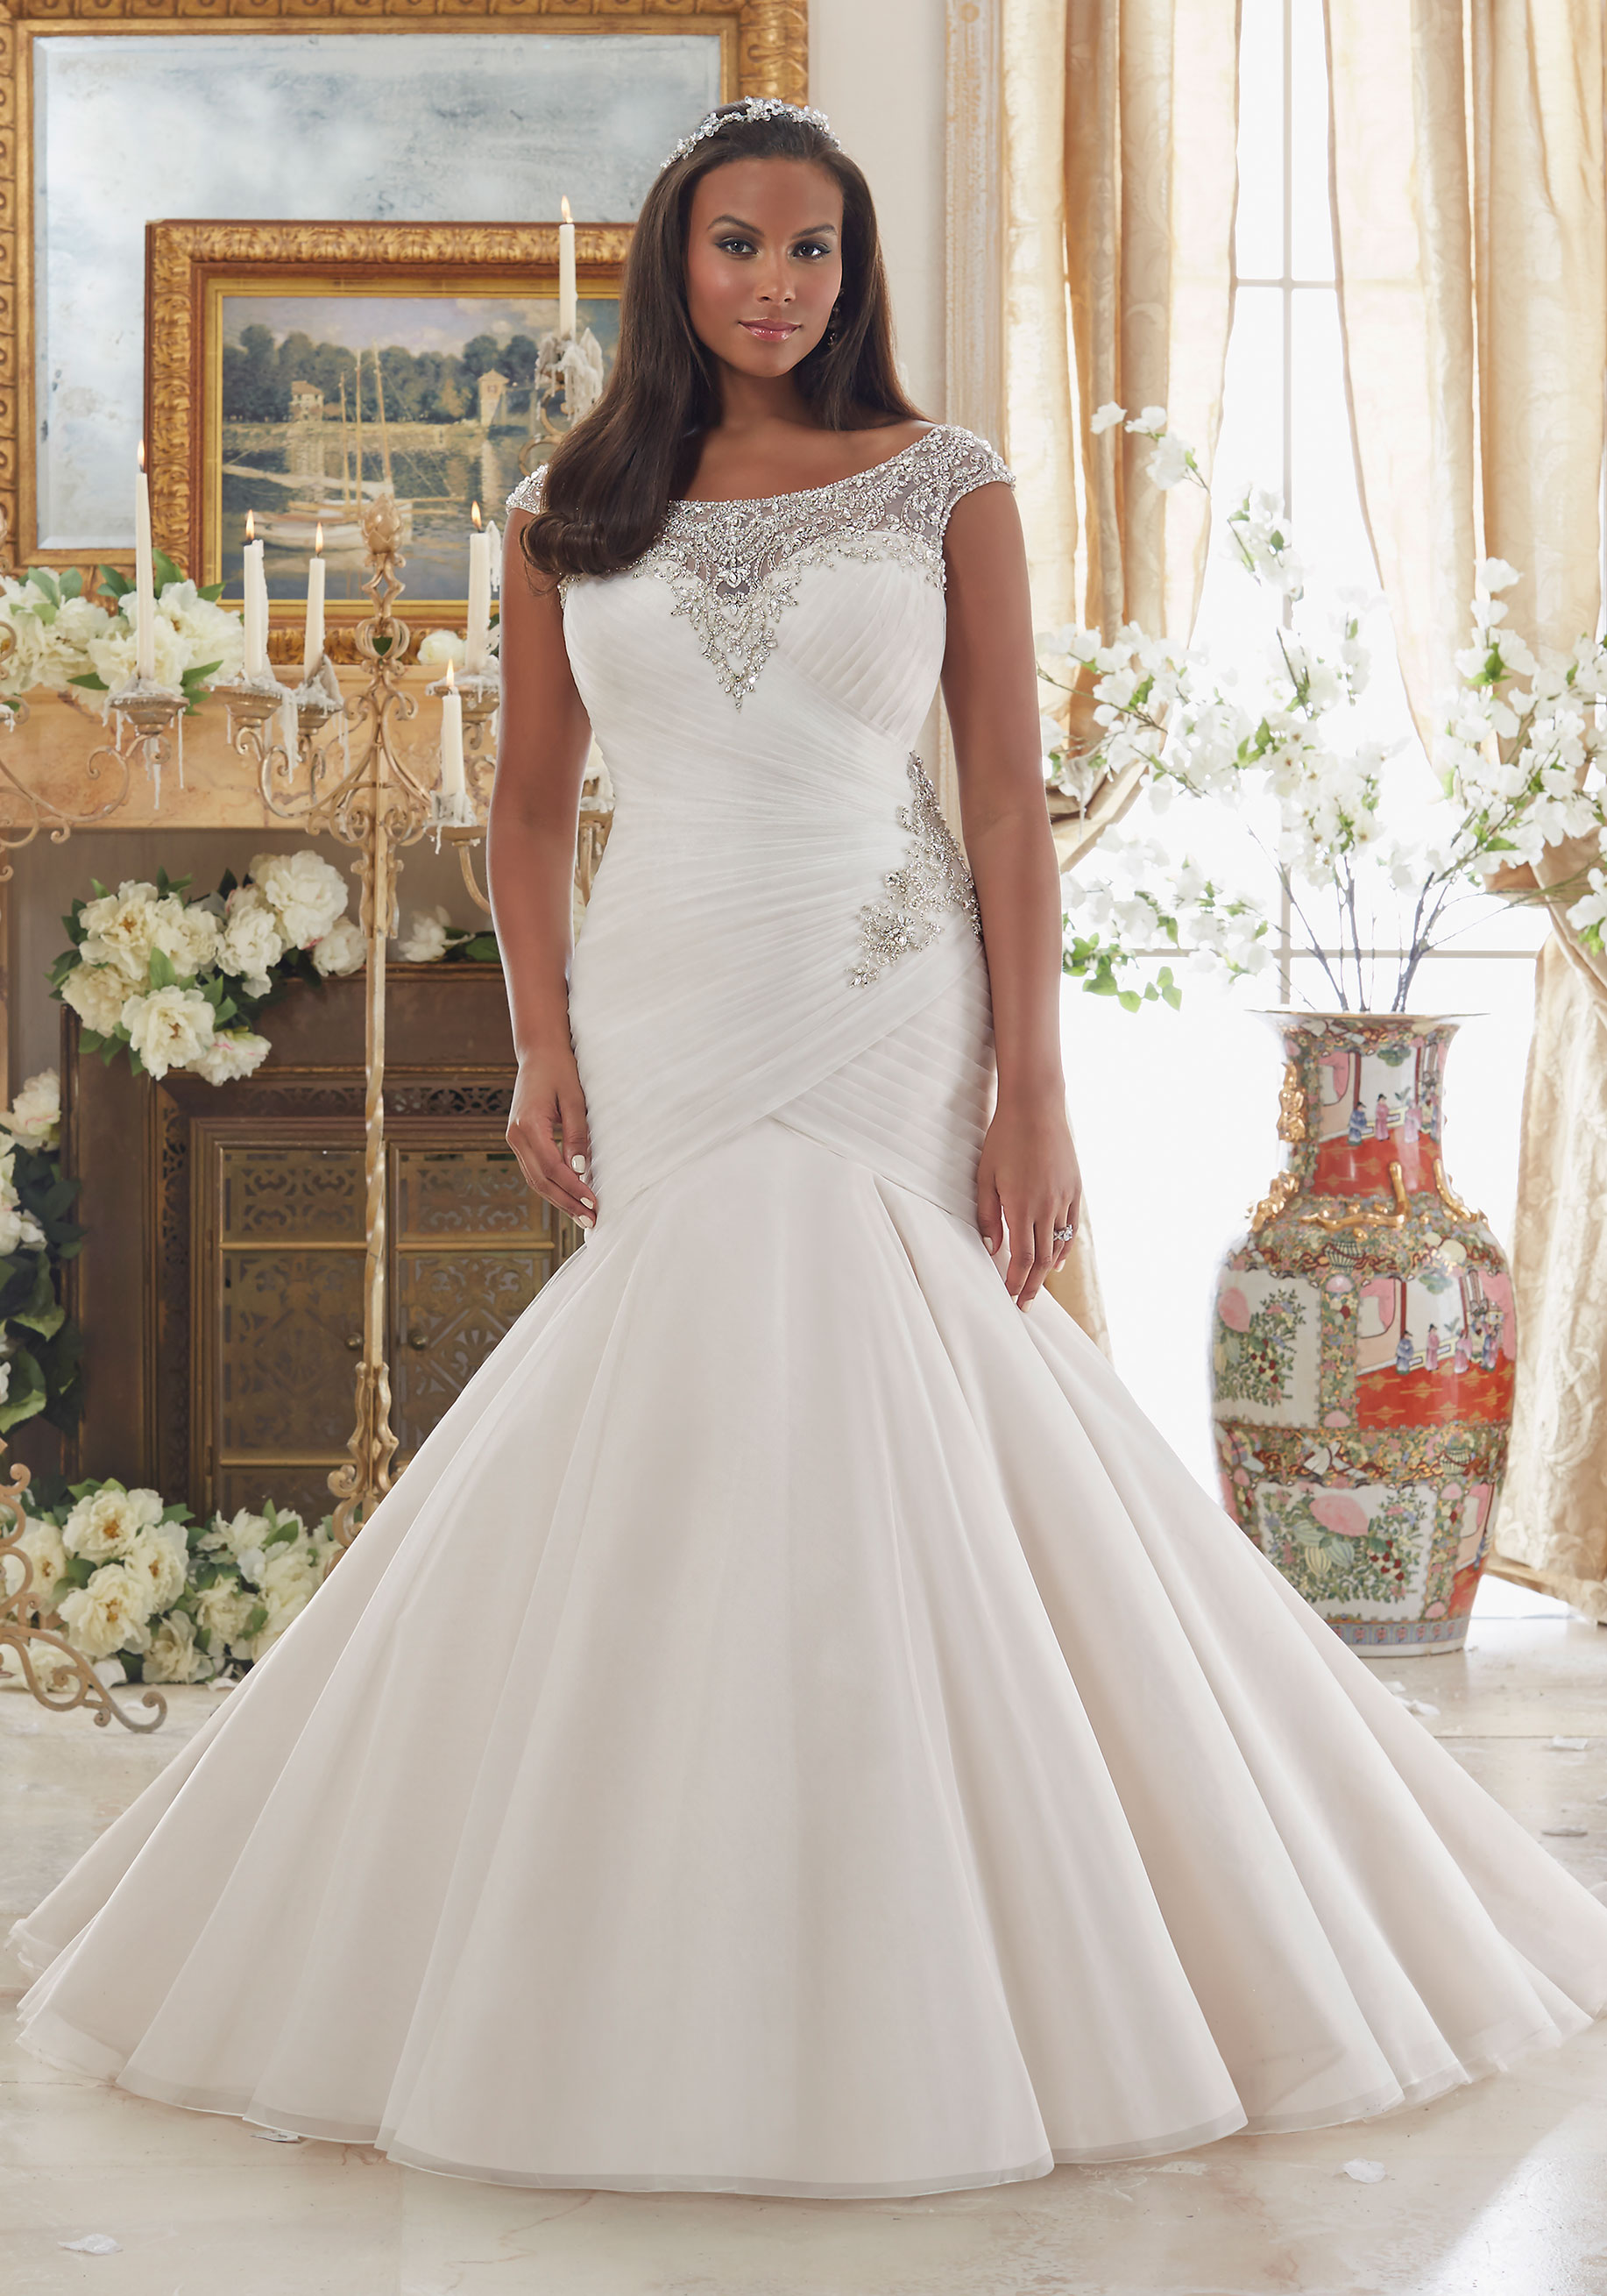 dresses for wedding plus size photo - 1